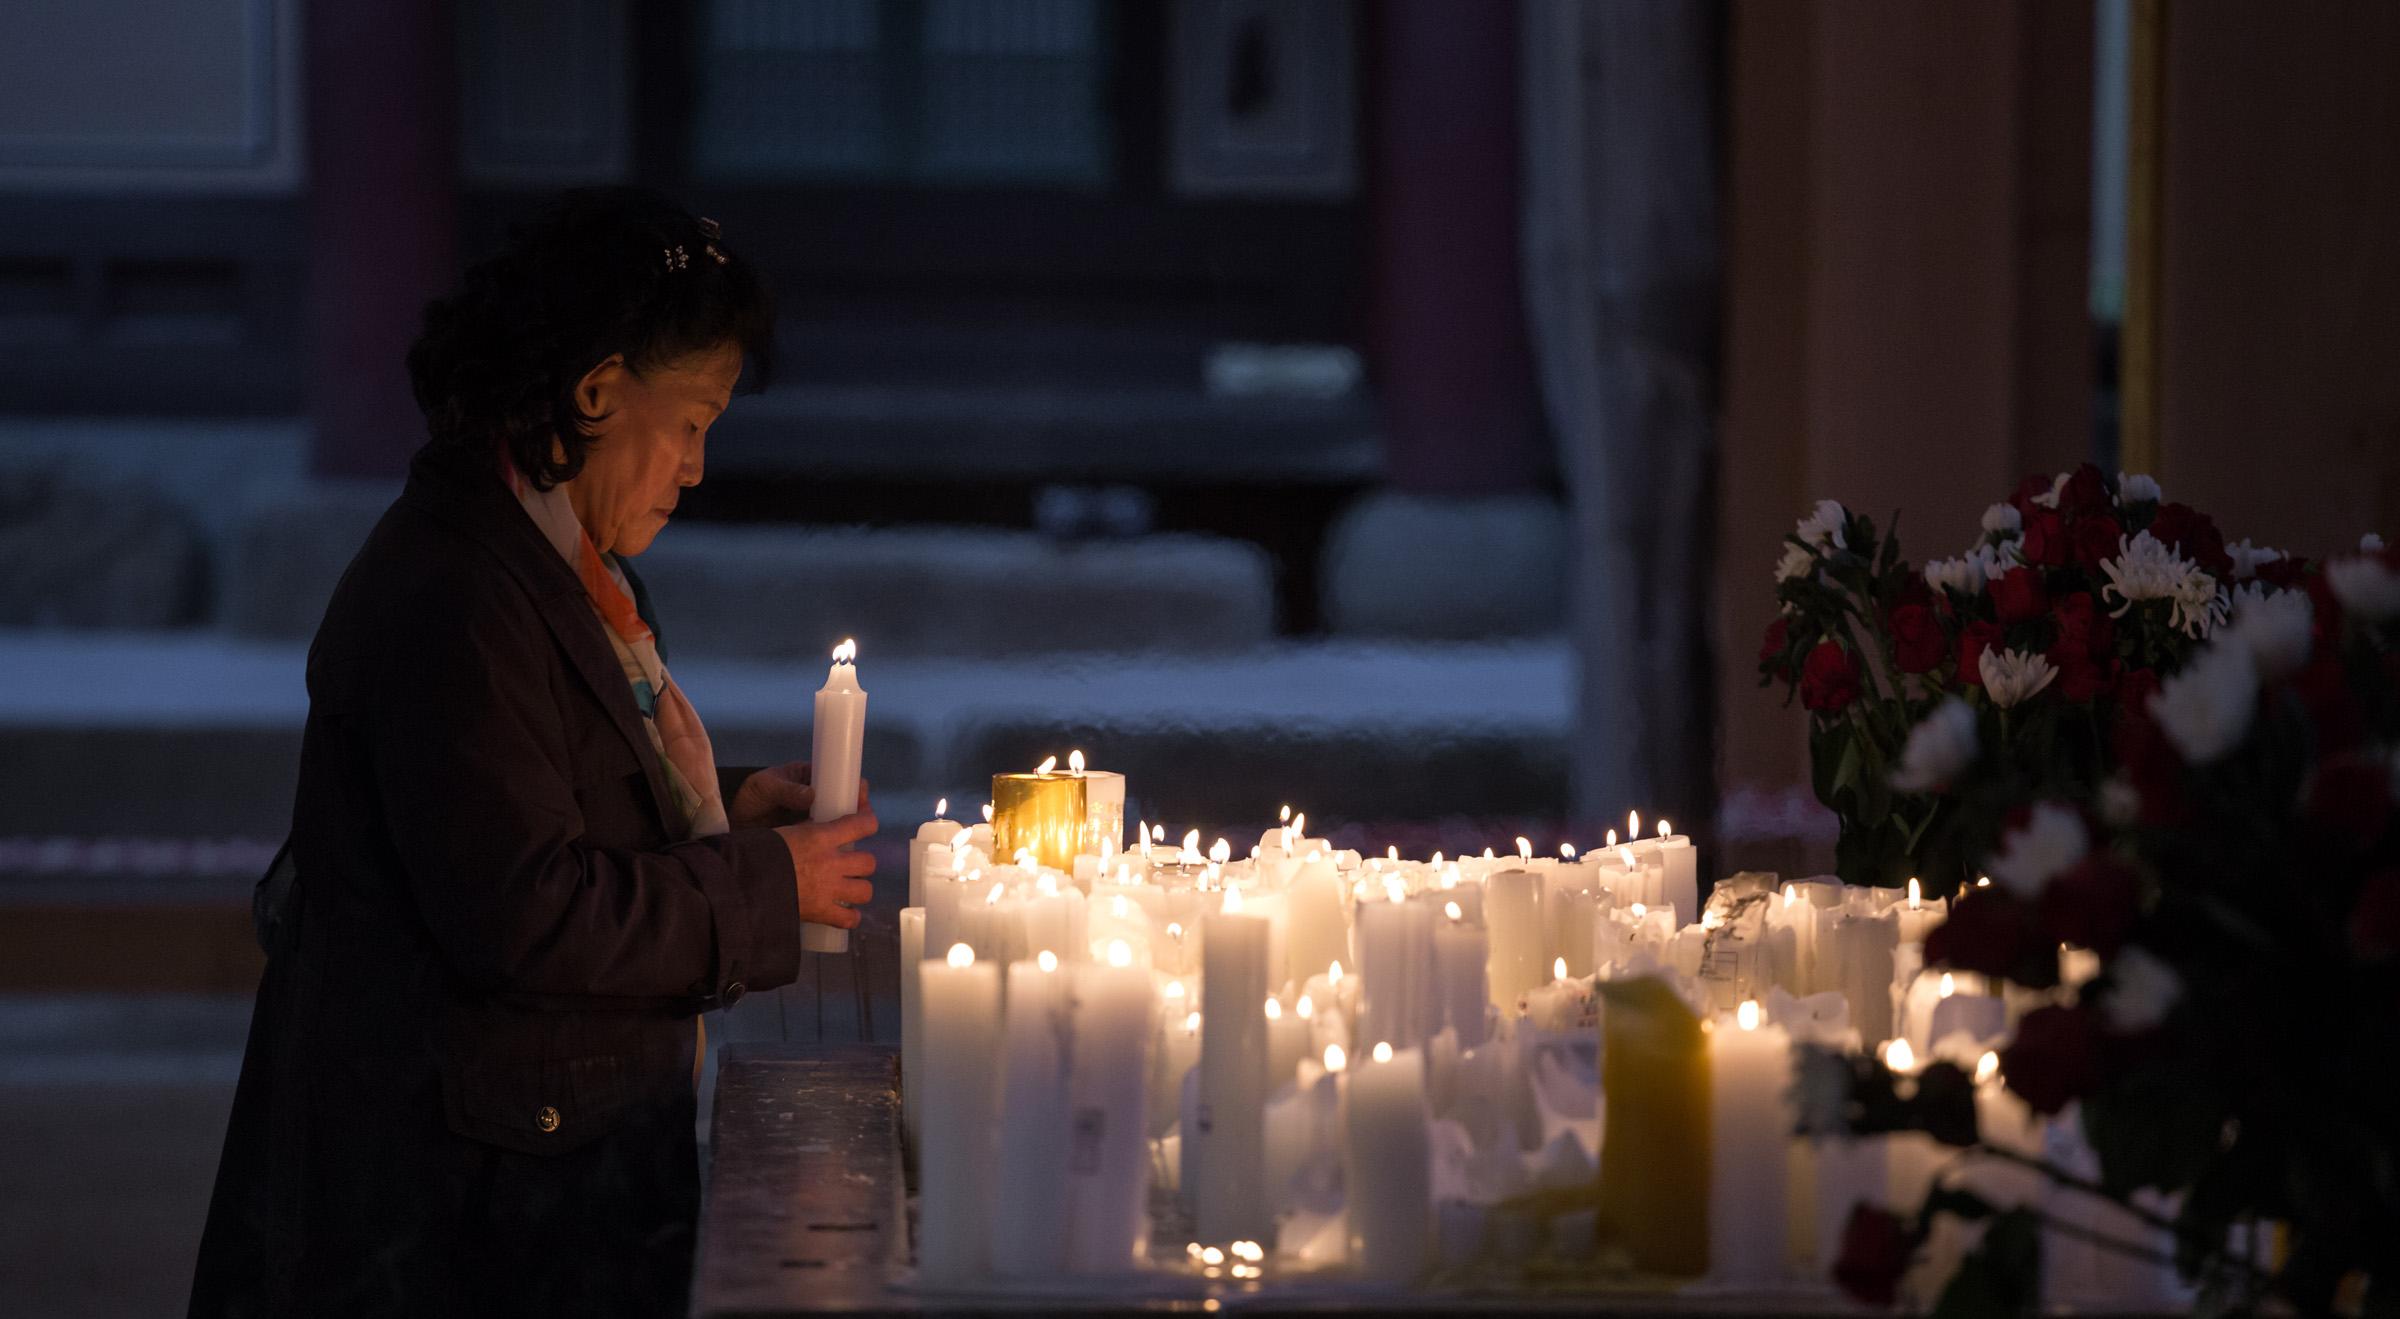 Prayer at dusk in Seoul, South Korea - by Brad Hammonds